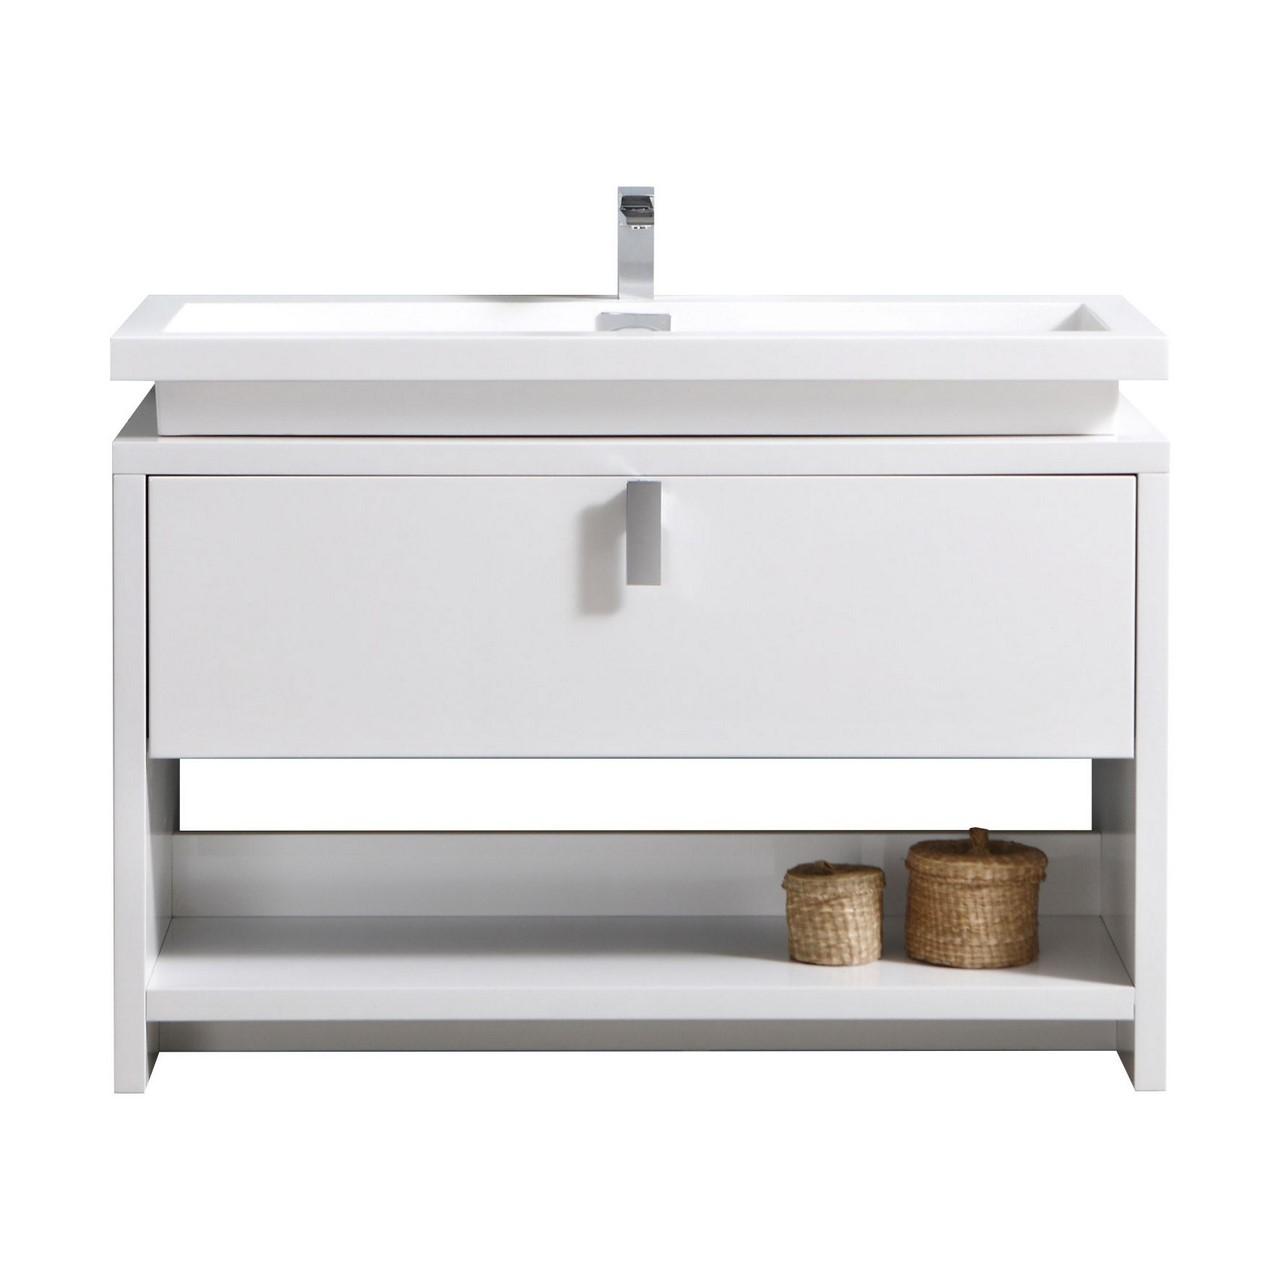 "Levi 48"" High Gloss White Modern Bathroom Vanity W/ Cubby"